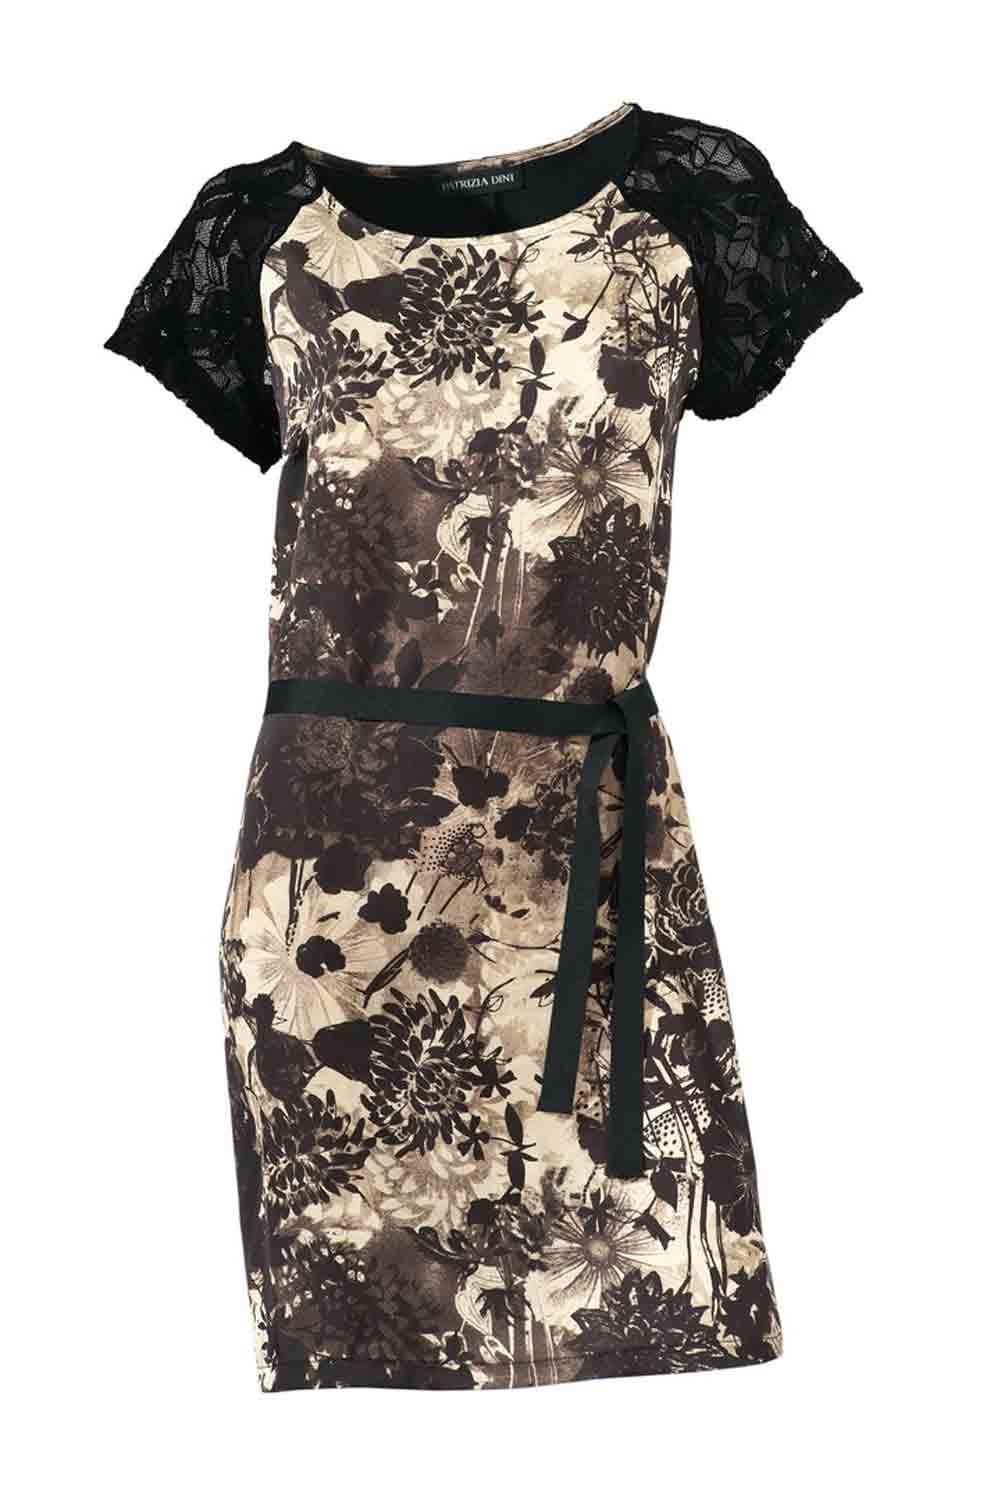 a369ee74e250f9 Patrizia Dini Damen Designer-Kleid mit Spitze